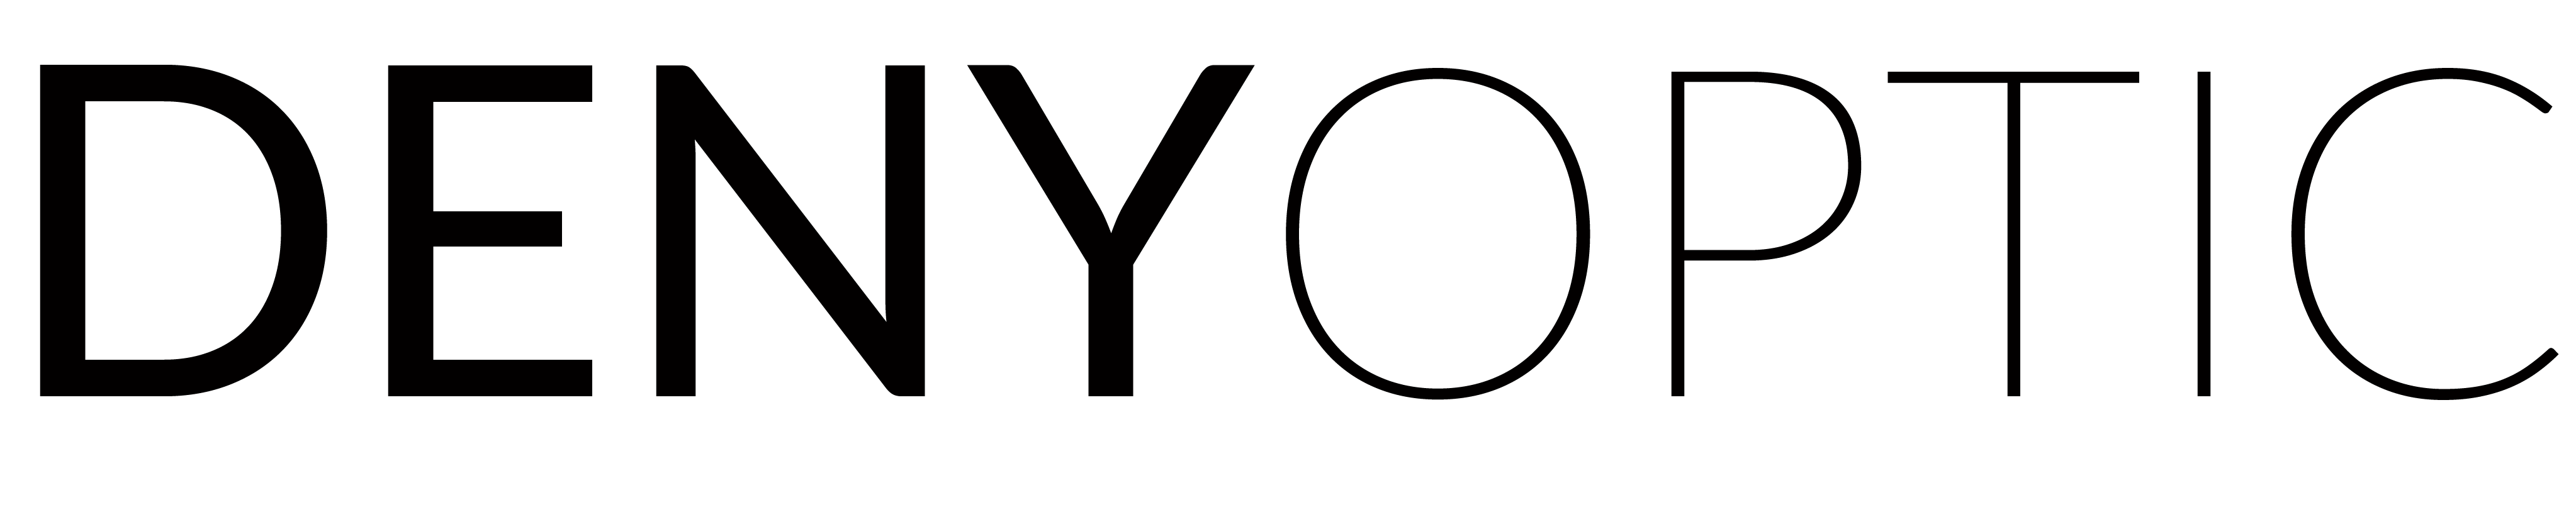 Opticien Metz & Ban Saint Martin – Spécialiste Optique Metz depuis 2001